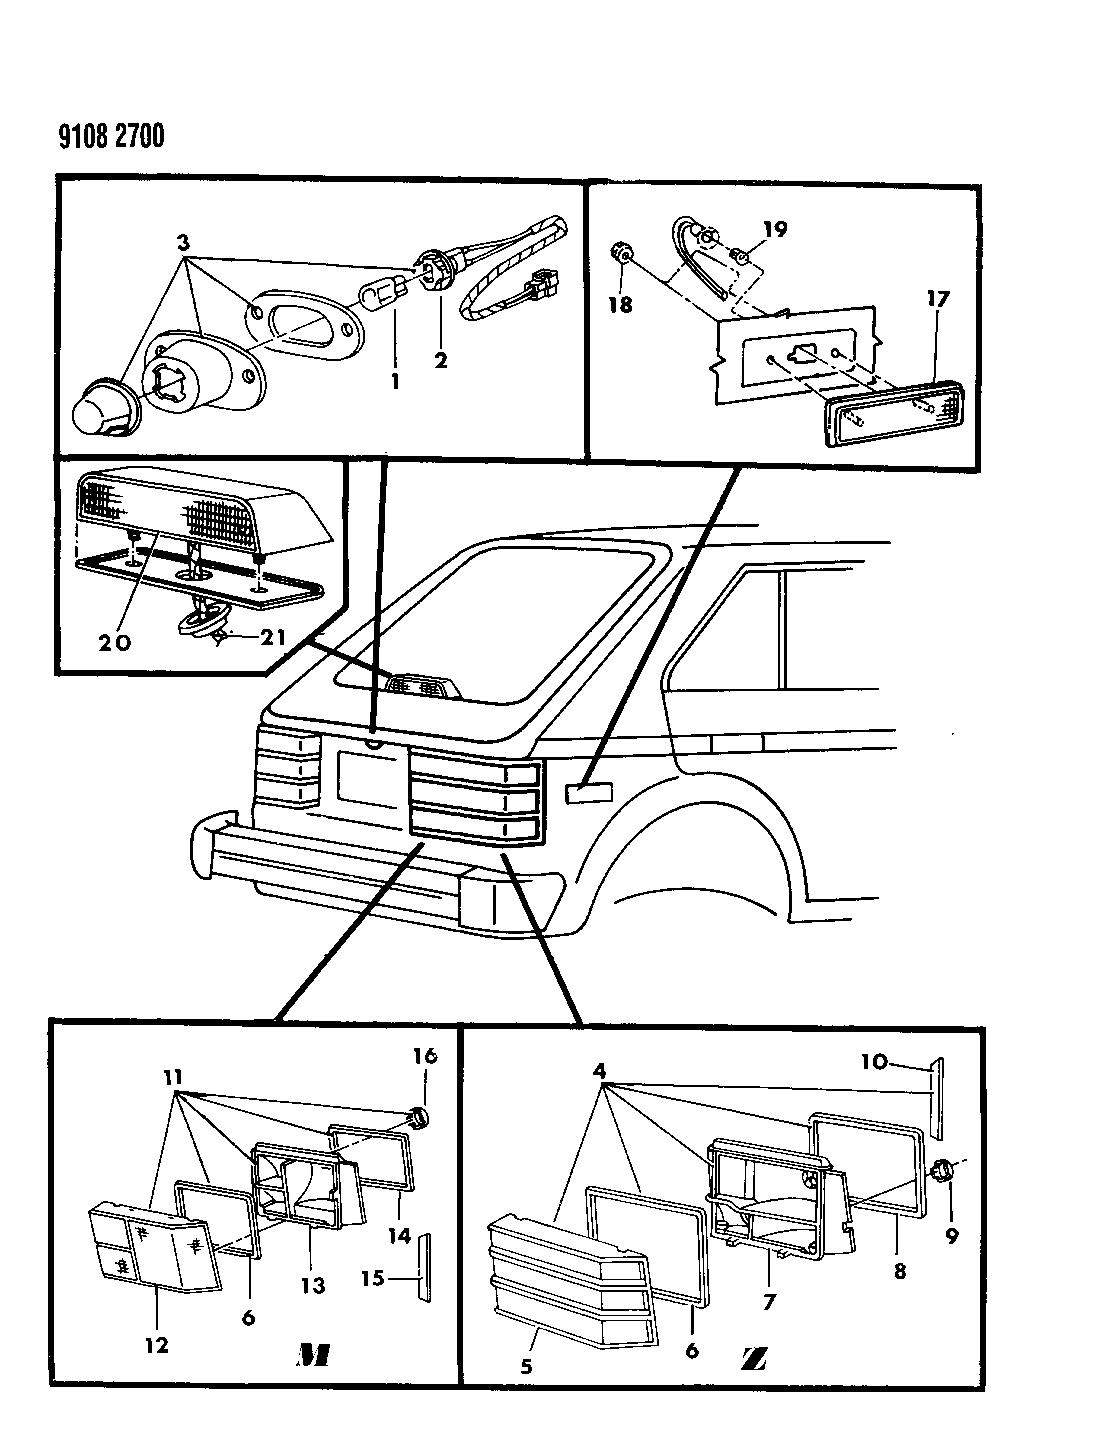 1989 Dodge Omni Lamps Wiring Rear Mopar Parts Giant Diagram